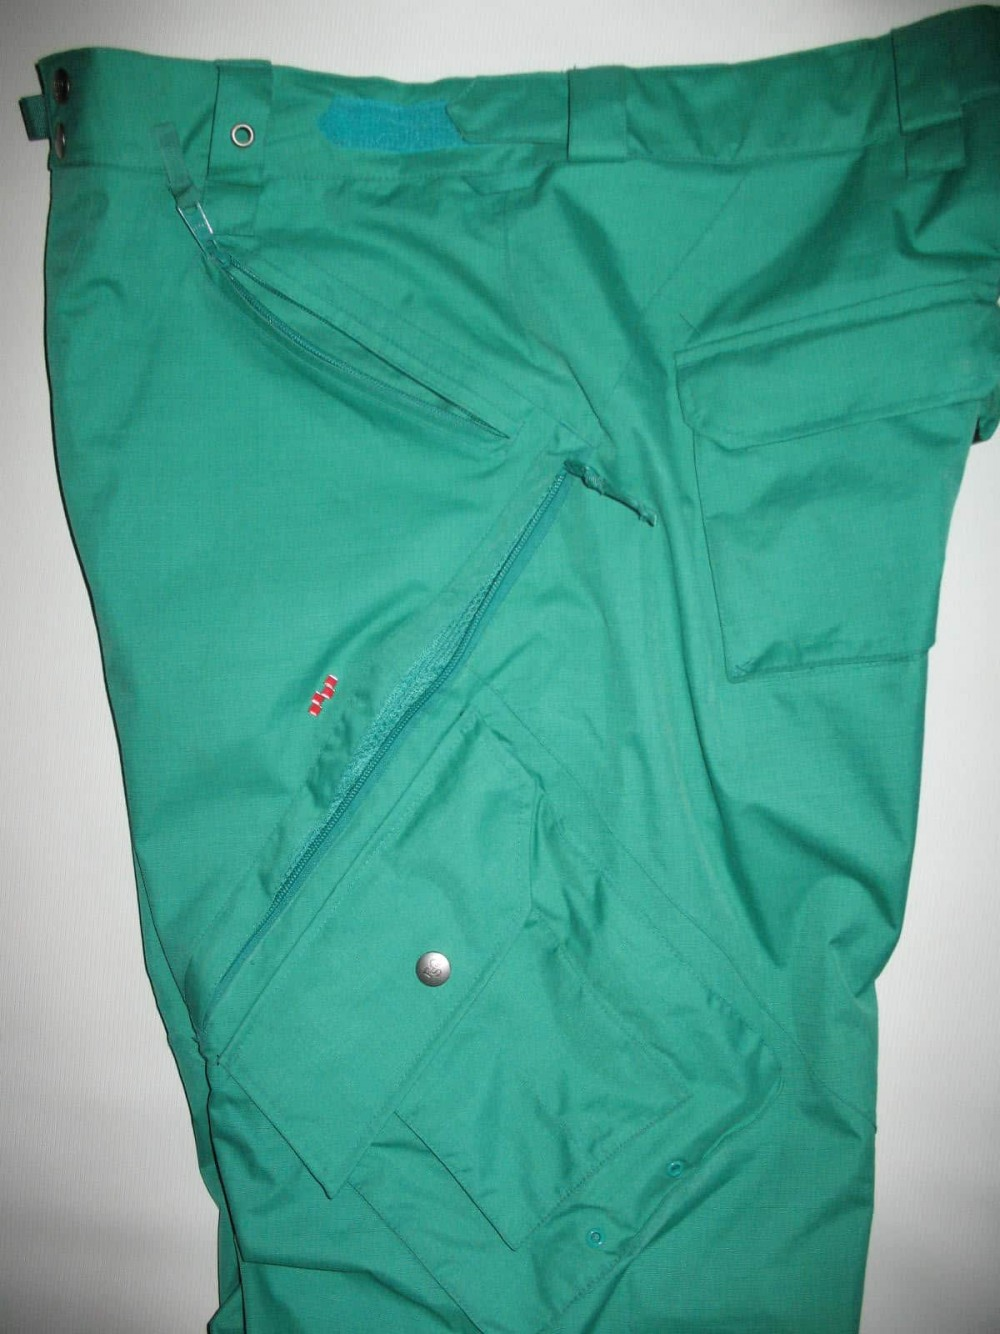 Штаны FOURSQUARE q snowboard pants (размер XL) - 9